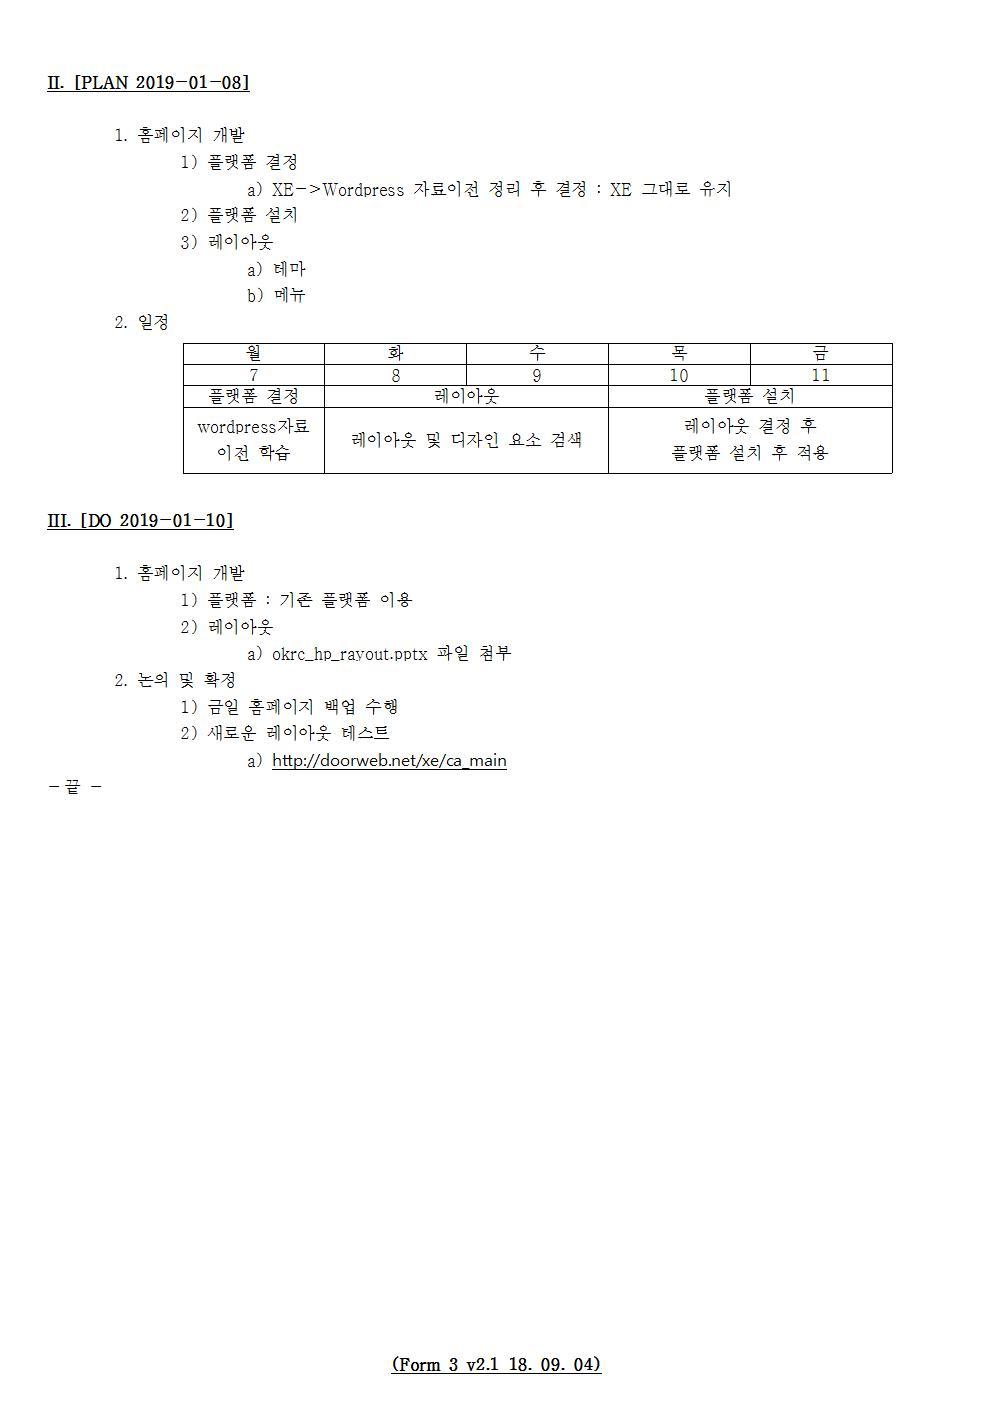 D-[19-021-RC-03]-[OKRCHP V2.0]-[2019-01-10][HH]002.jpg